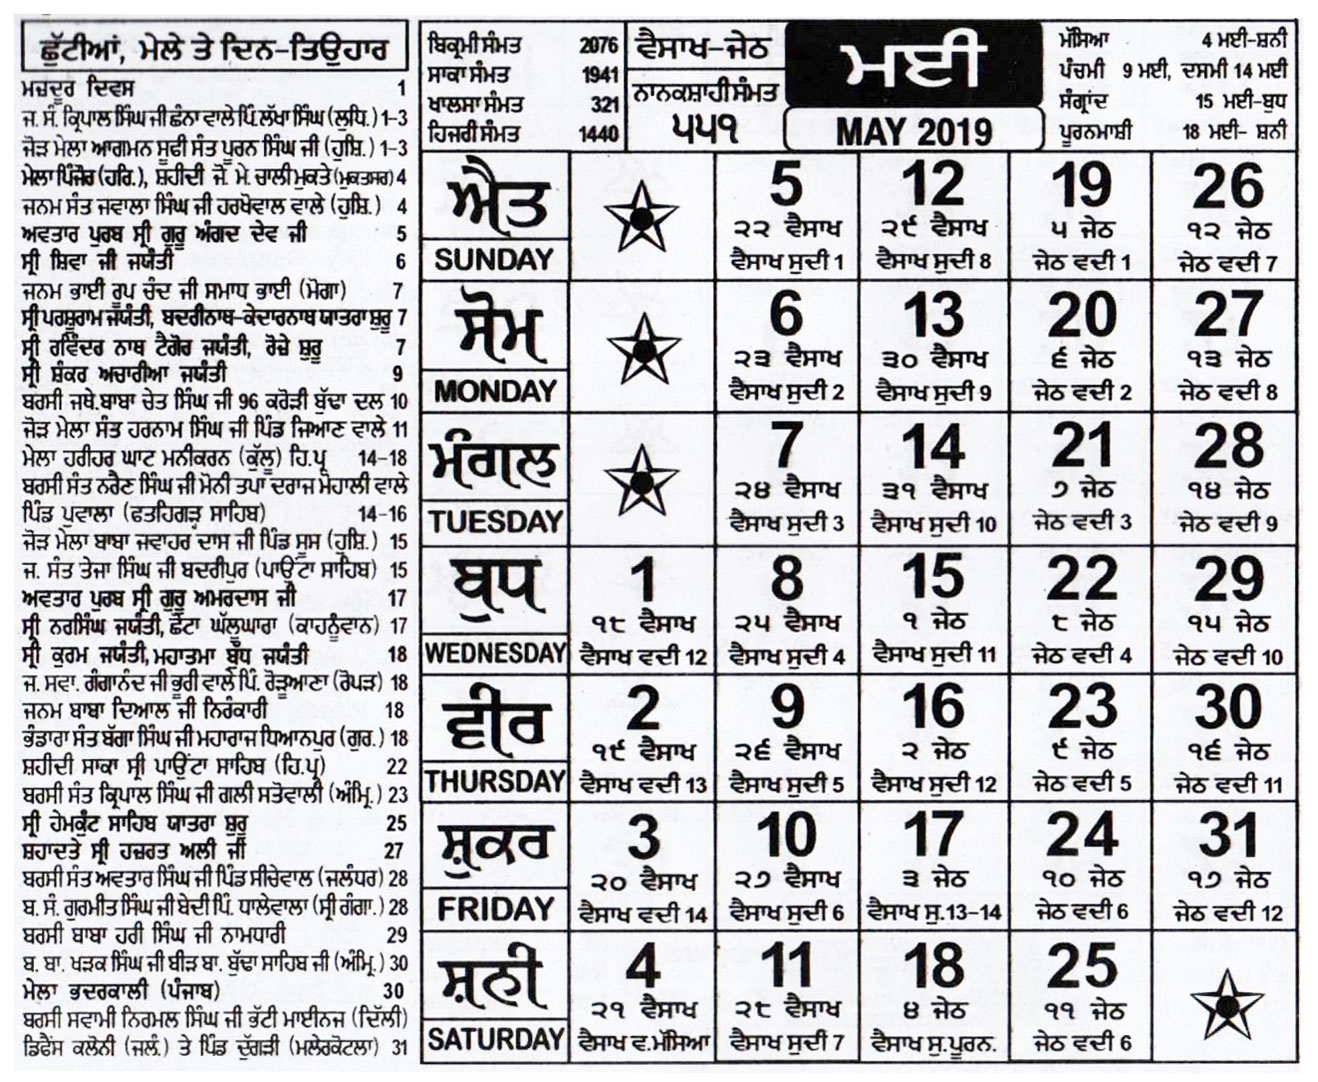 Khalsa Heera Jantri 2019  Nitnem Path throughout Khalsa Heera Jantri 2020